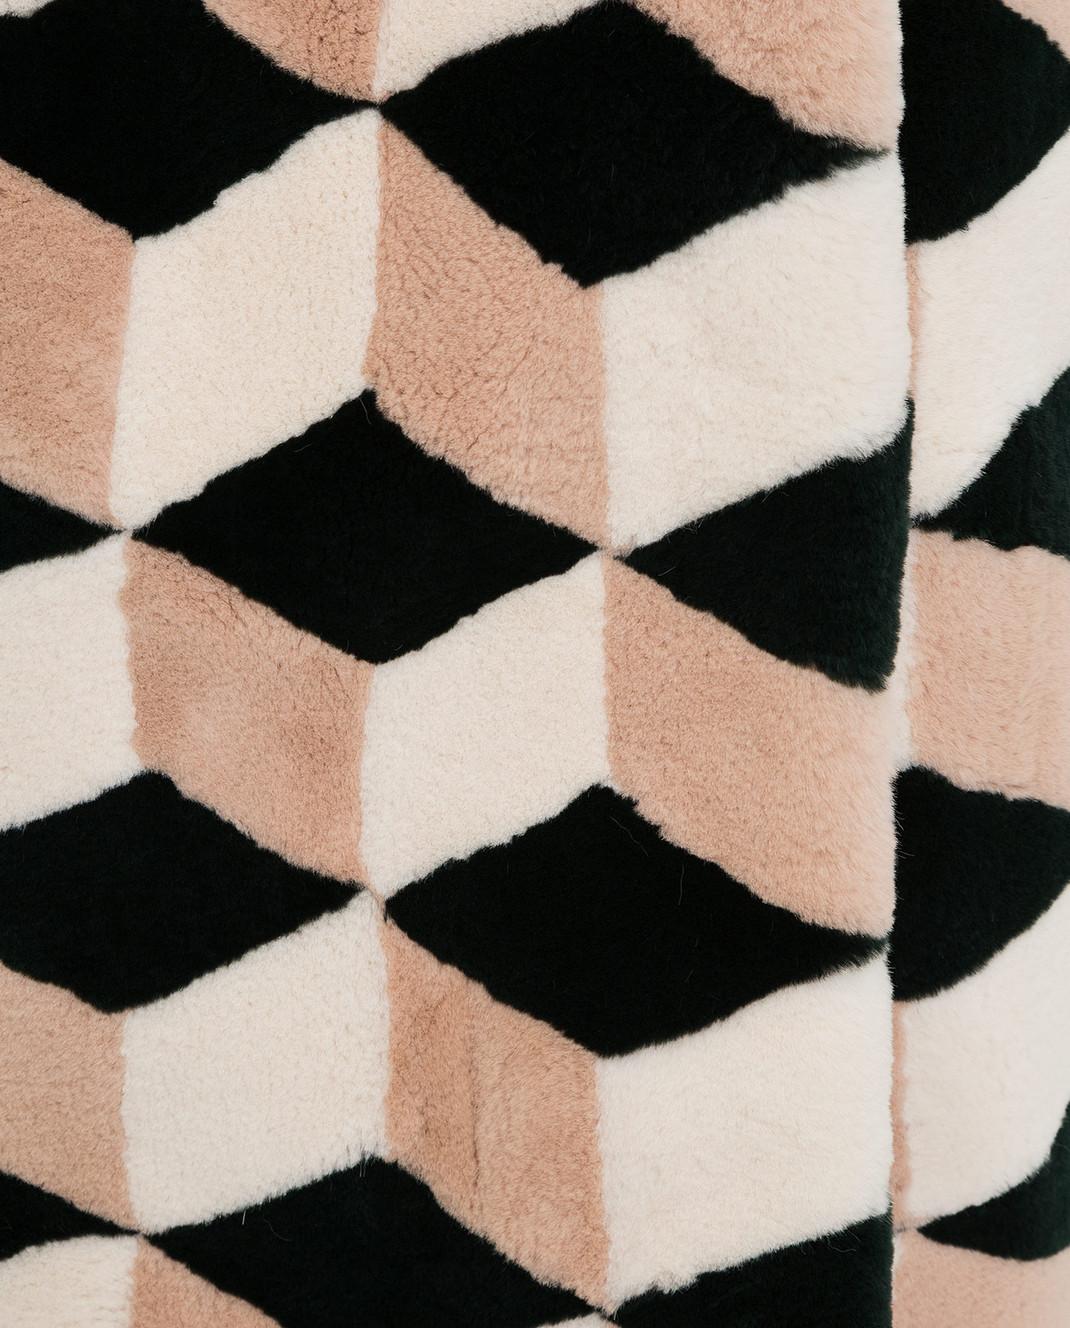 Giuliana Teso Шуба из меха кролика 54AFH741 изображение 5